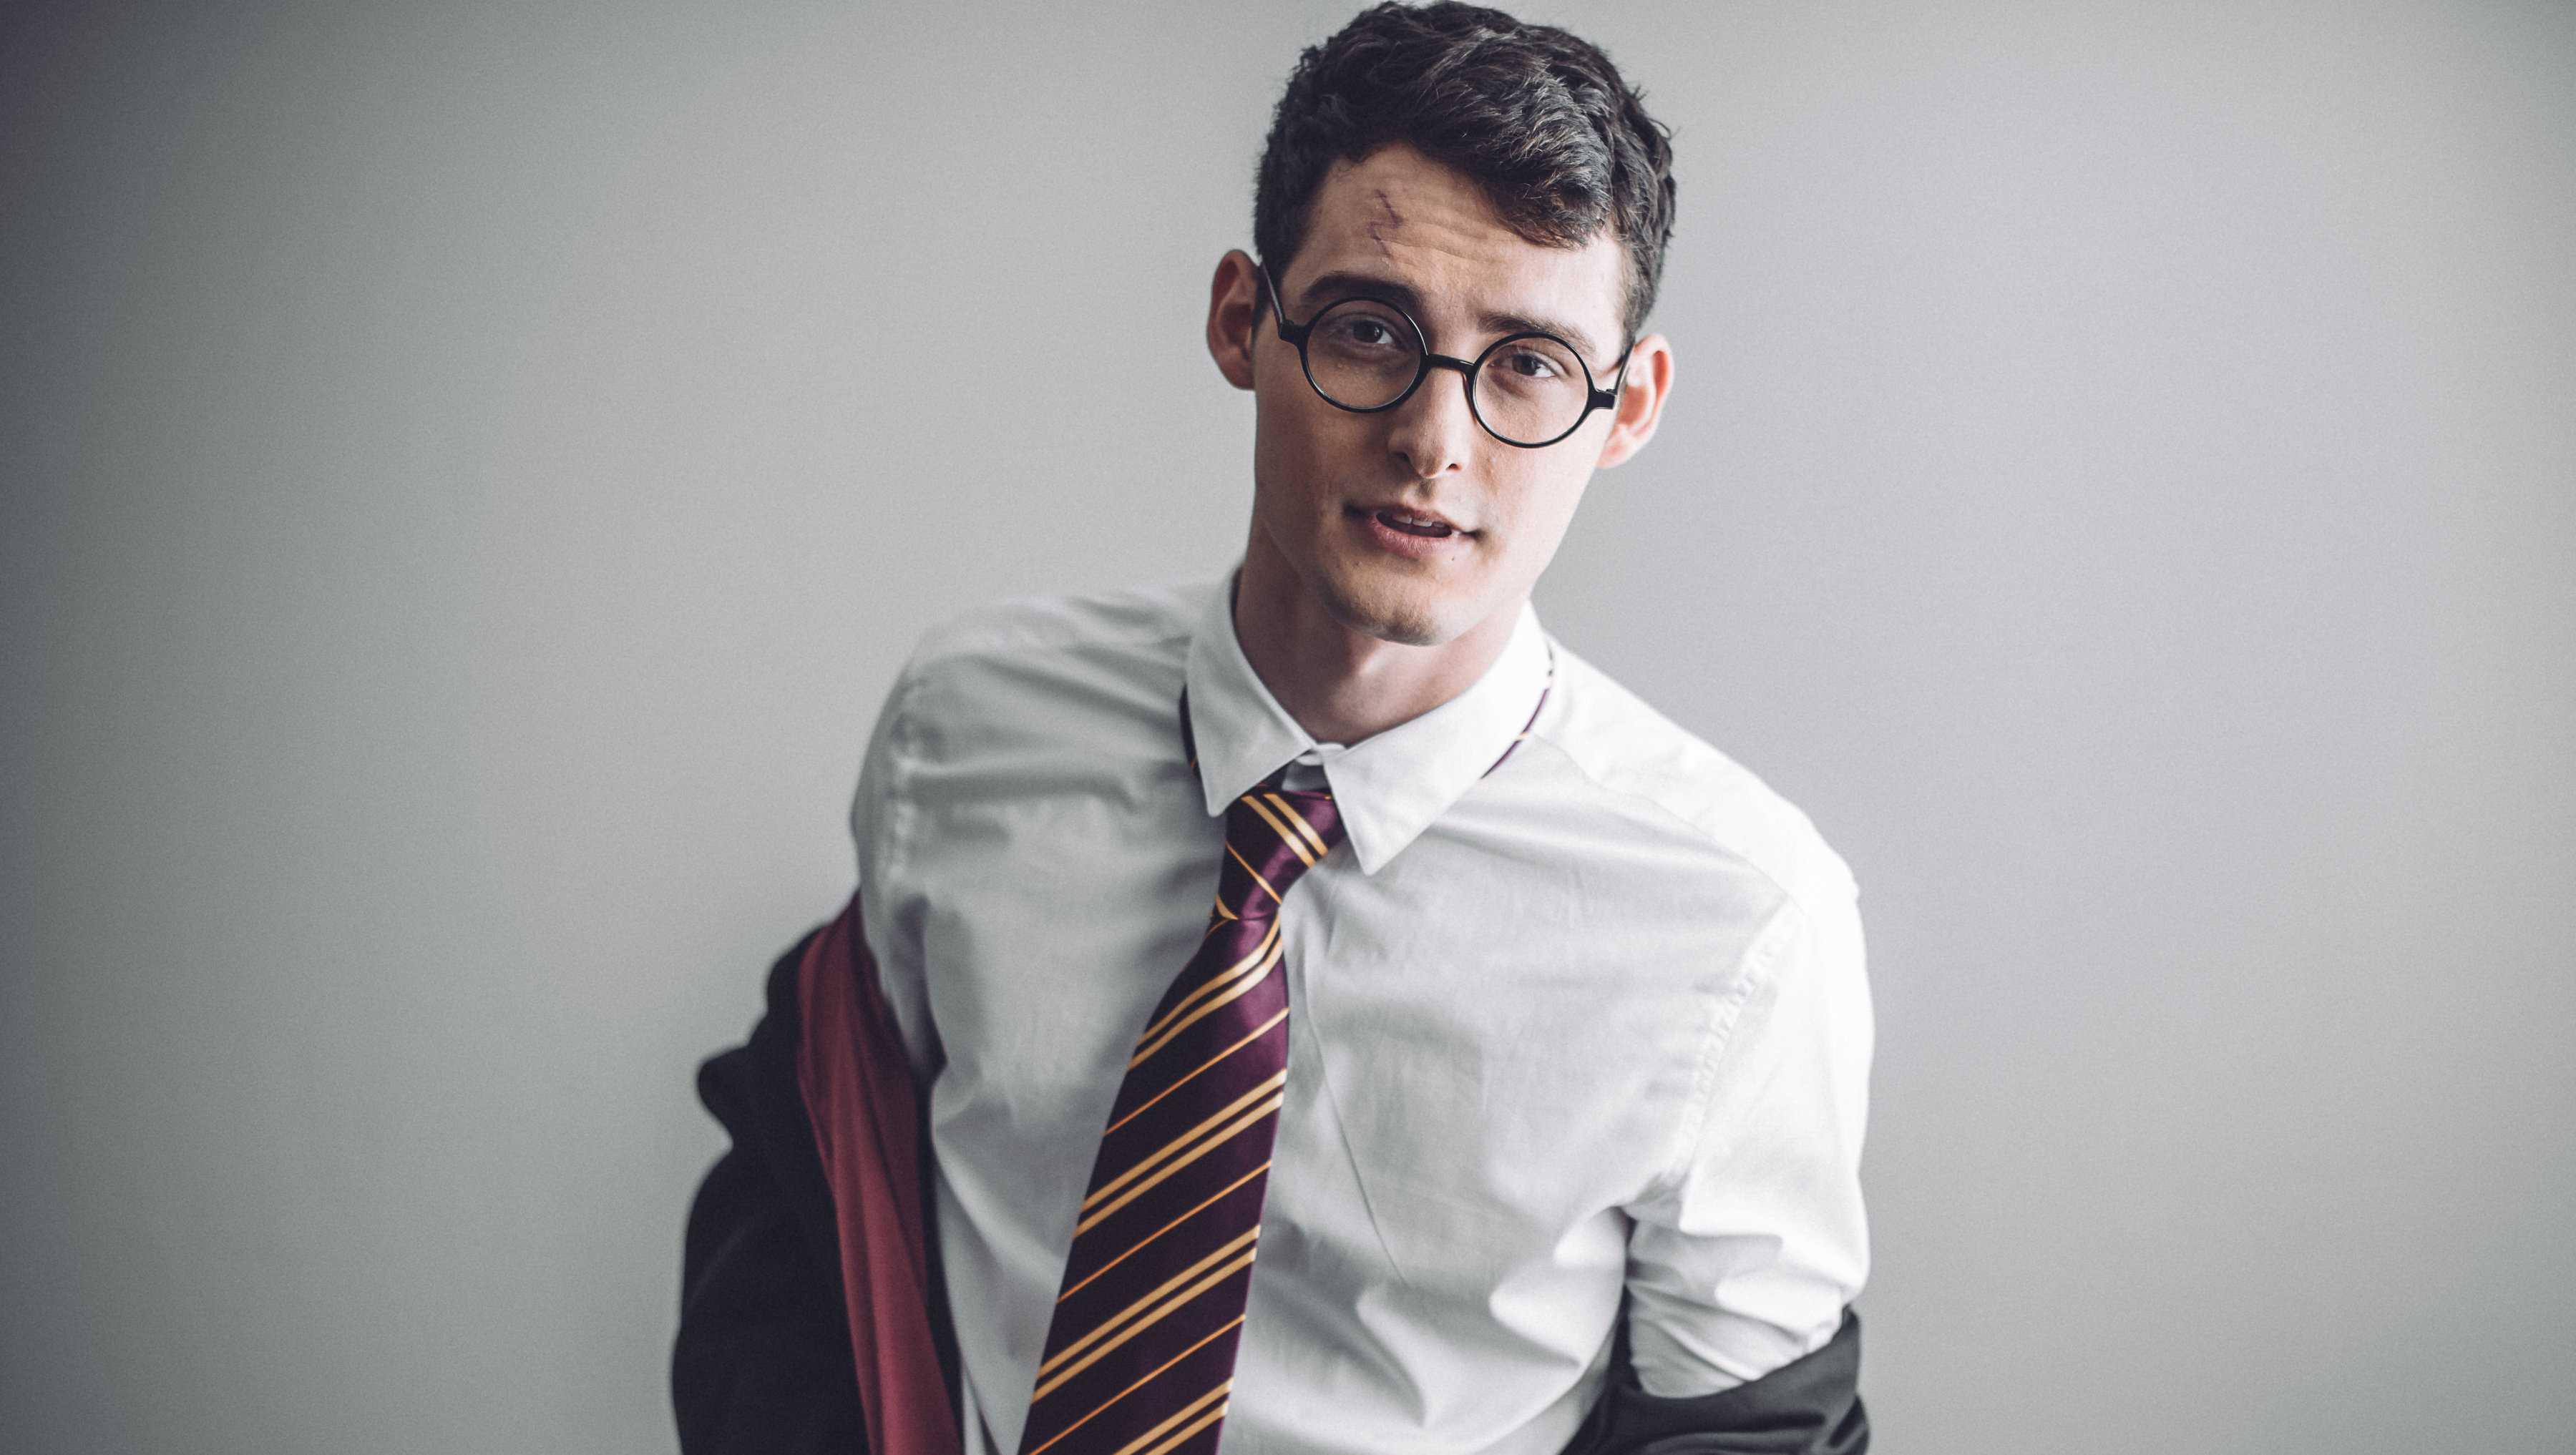 Harry Potter photoshoot